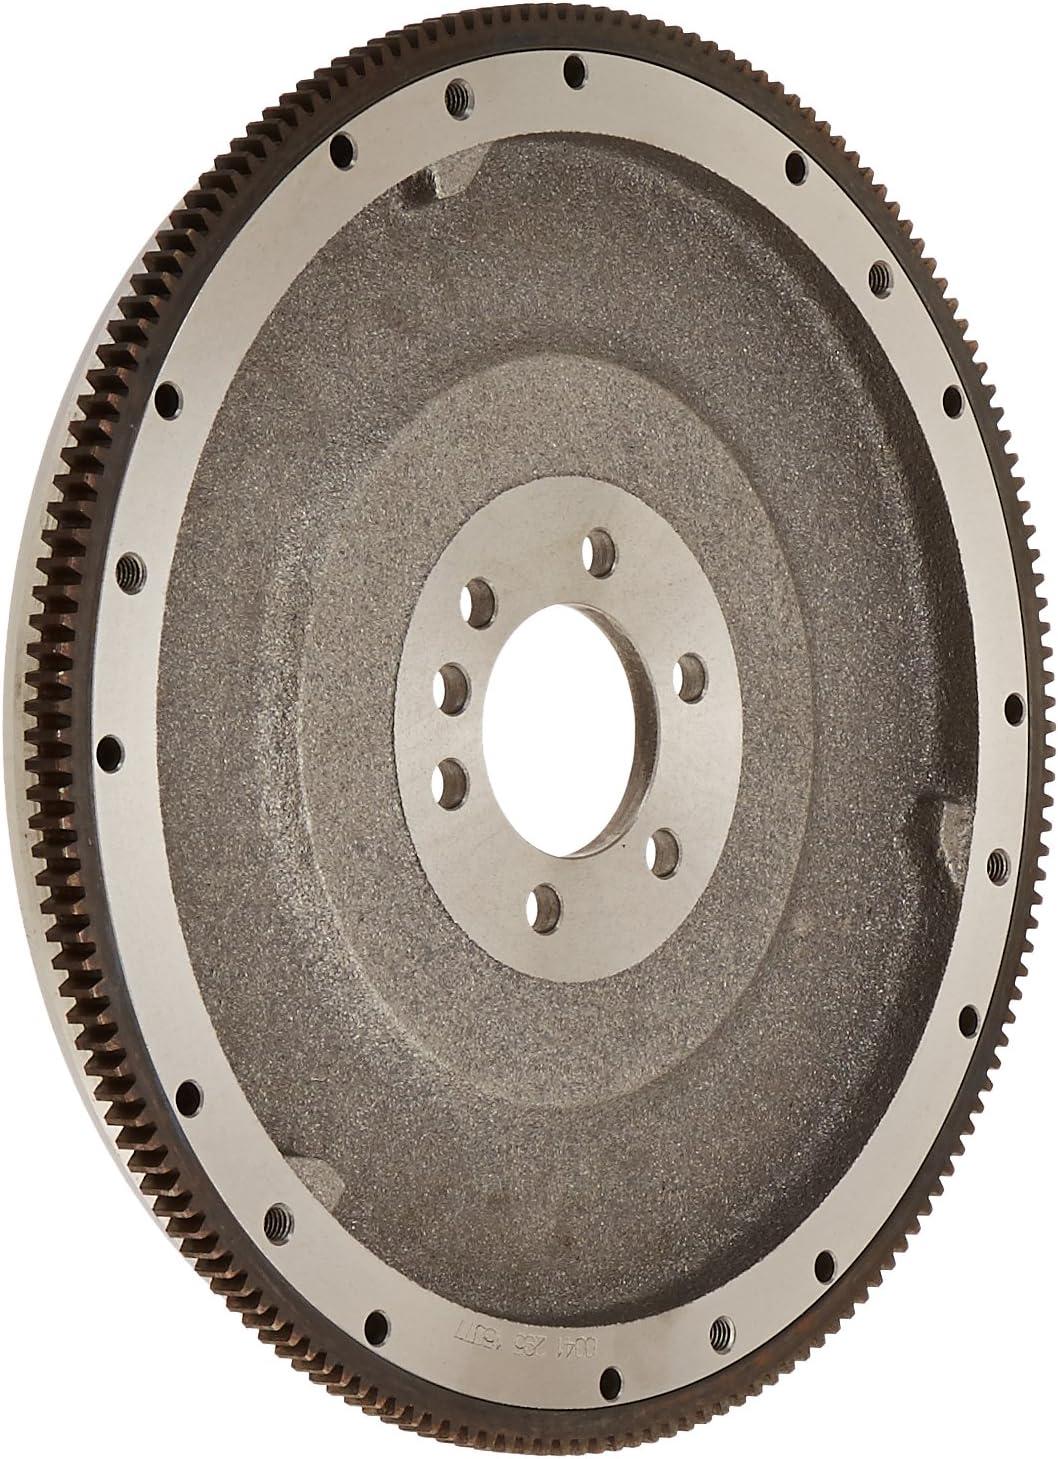 Clutch Flywheel OMIX 16912.10